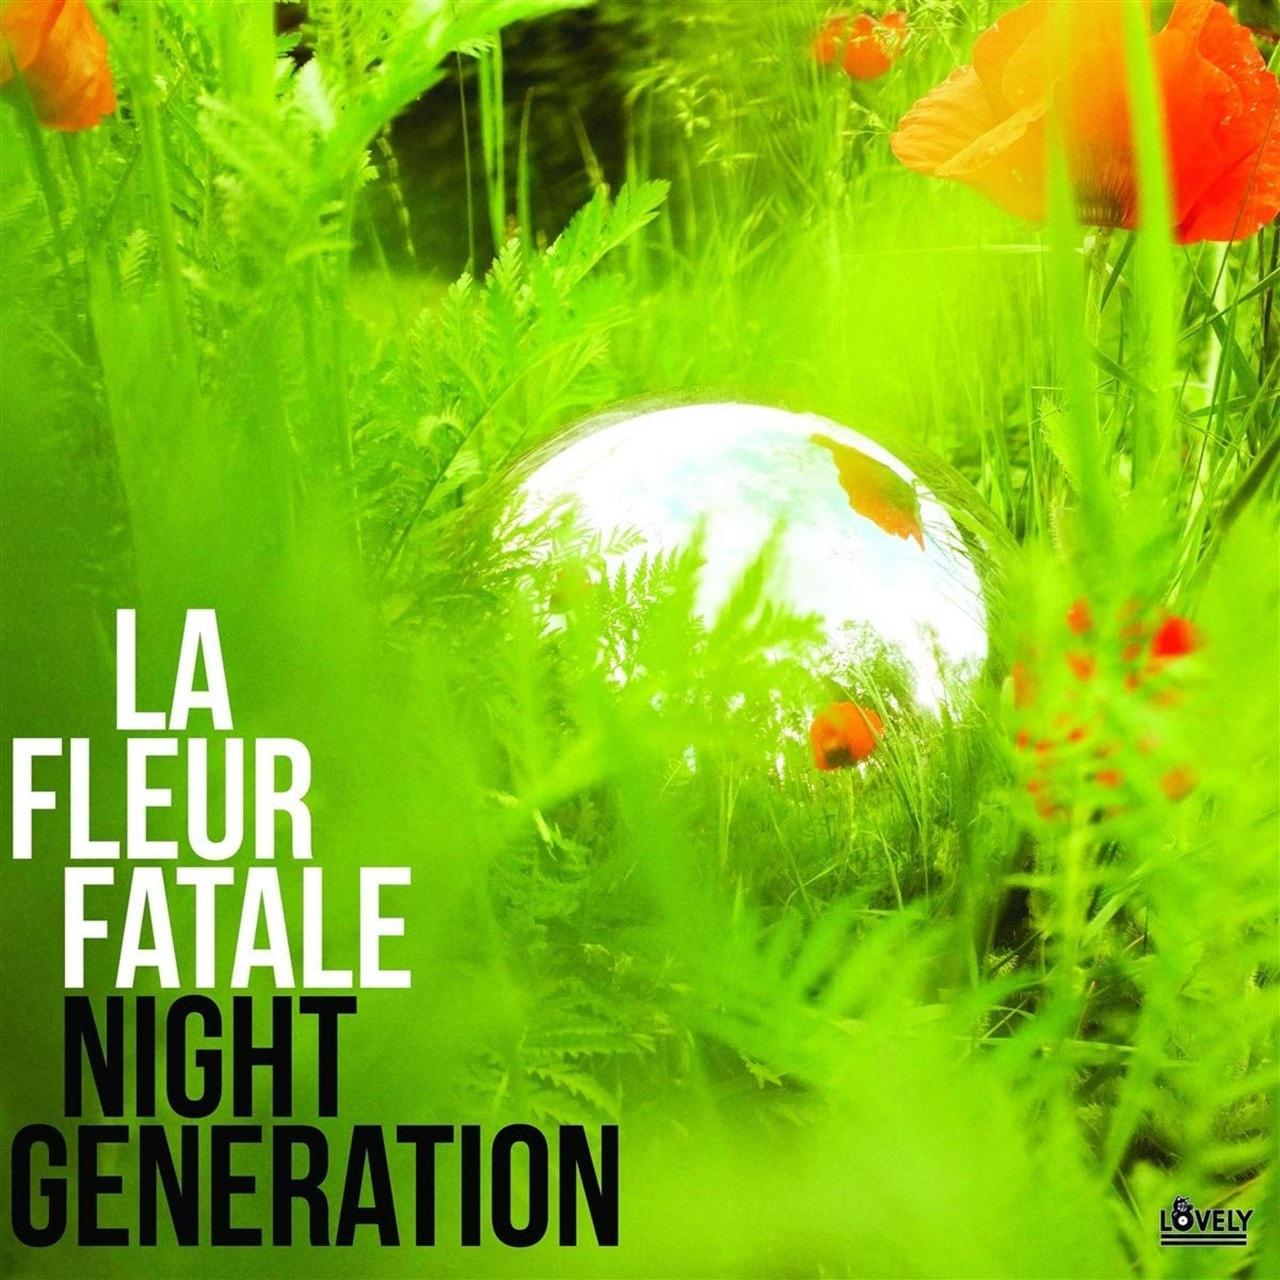 Night Generation - 1